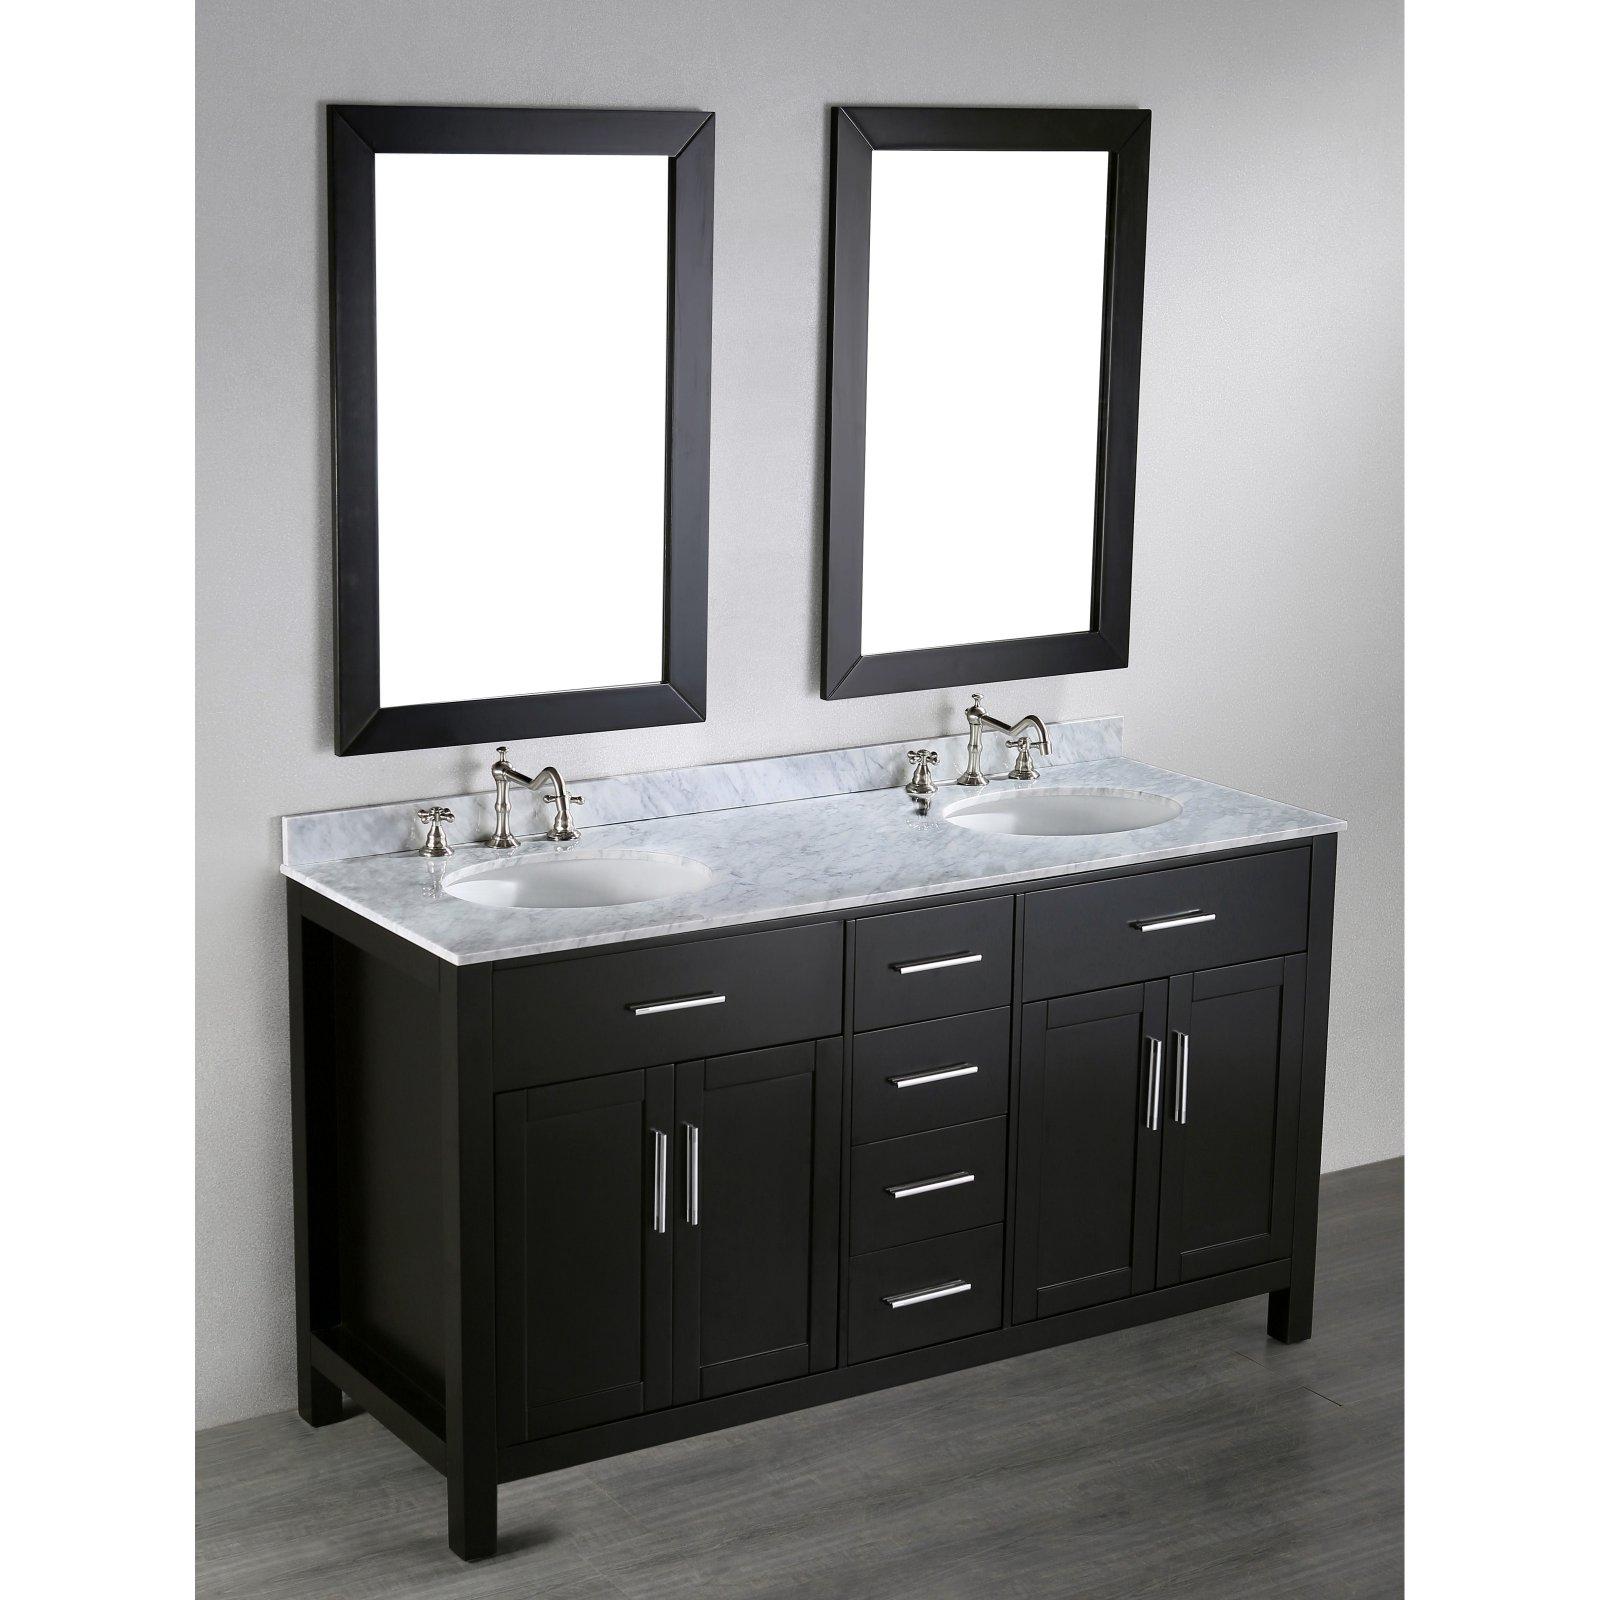 Bosconi Sb 252 4 60 In Double Bathroom Vanity Set Bathroom Sink